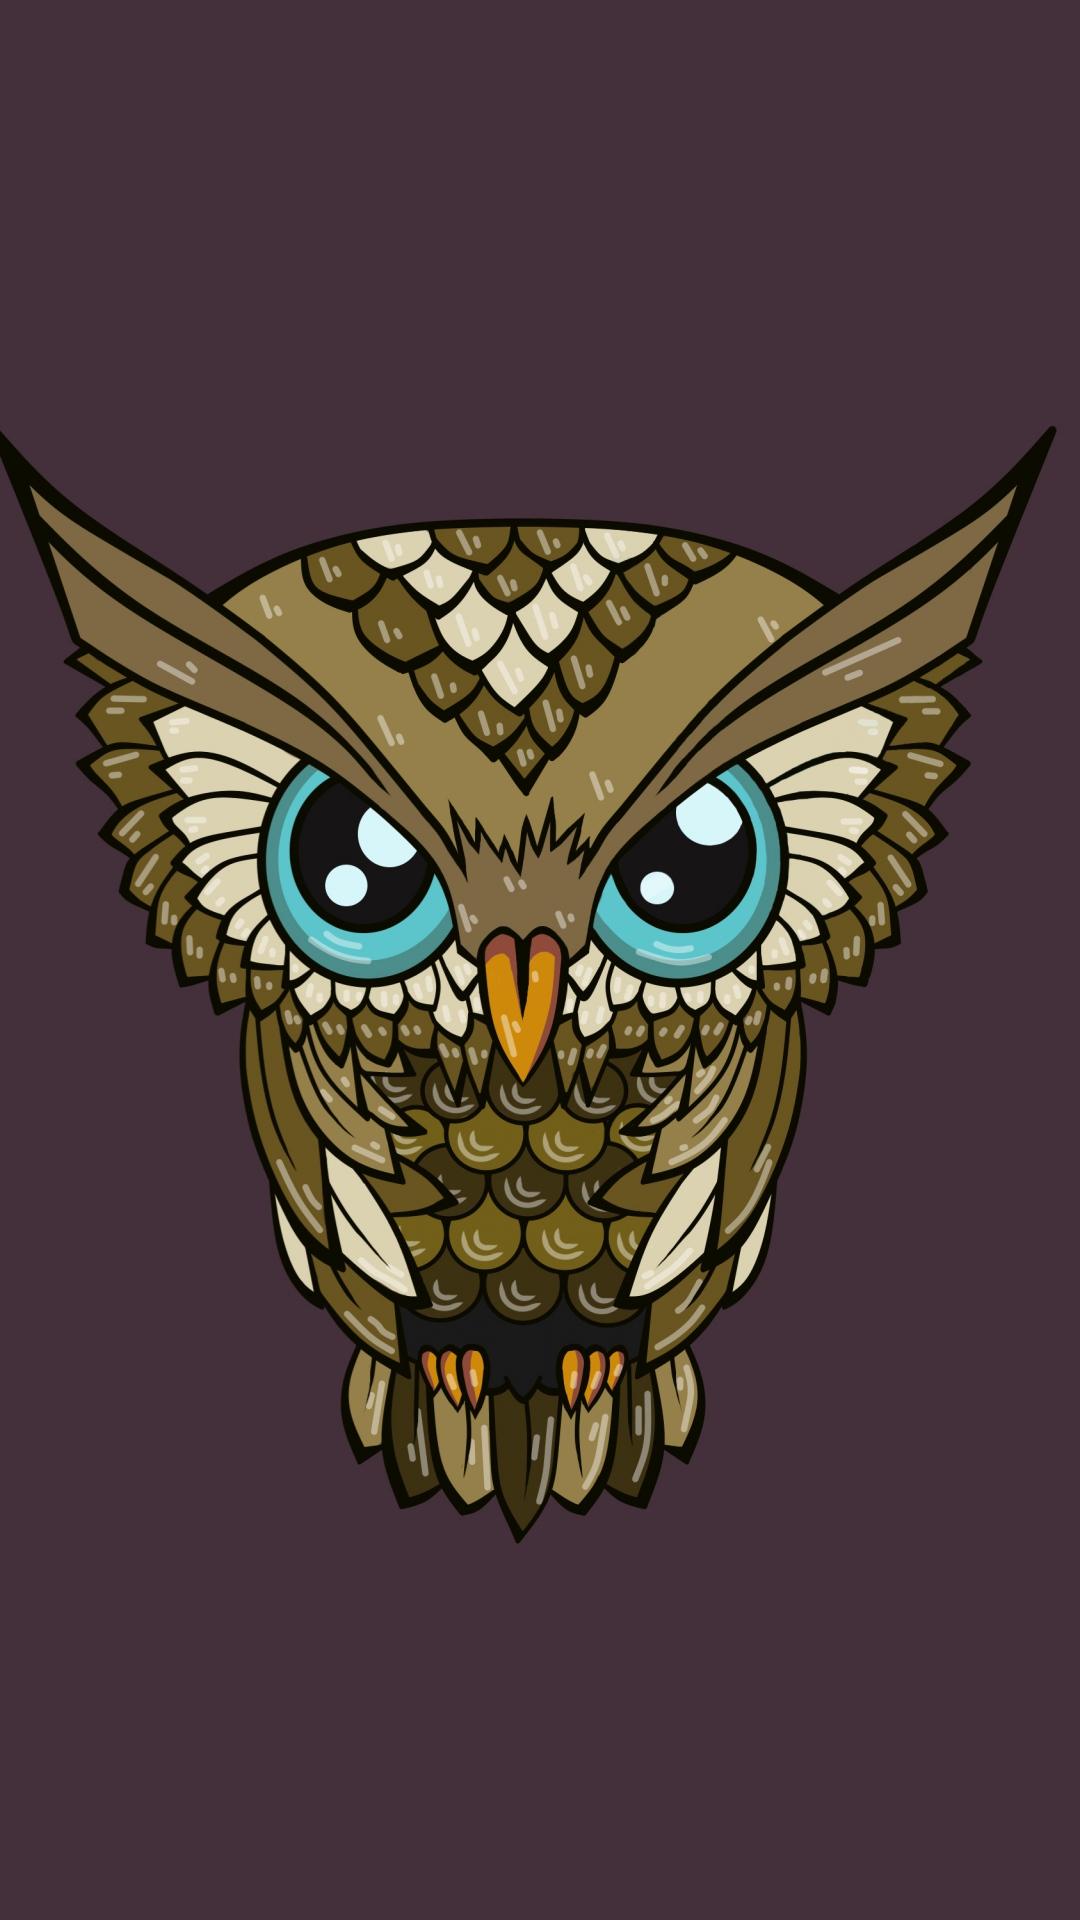 Cute Baby Couple Cartoon Wallpaper Hd Cute Owl Wallpaper For Android Pixelstalk Net